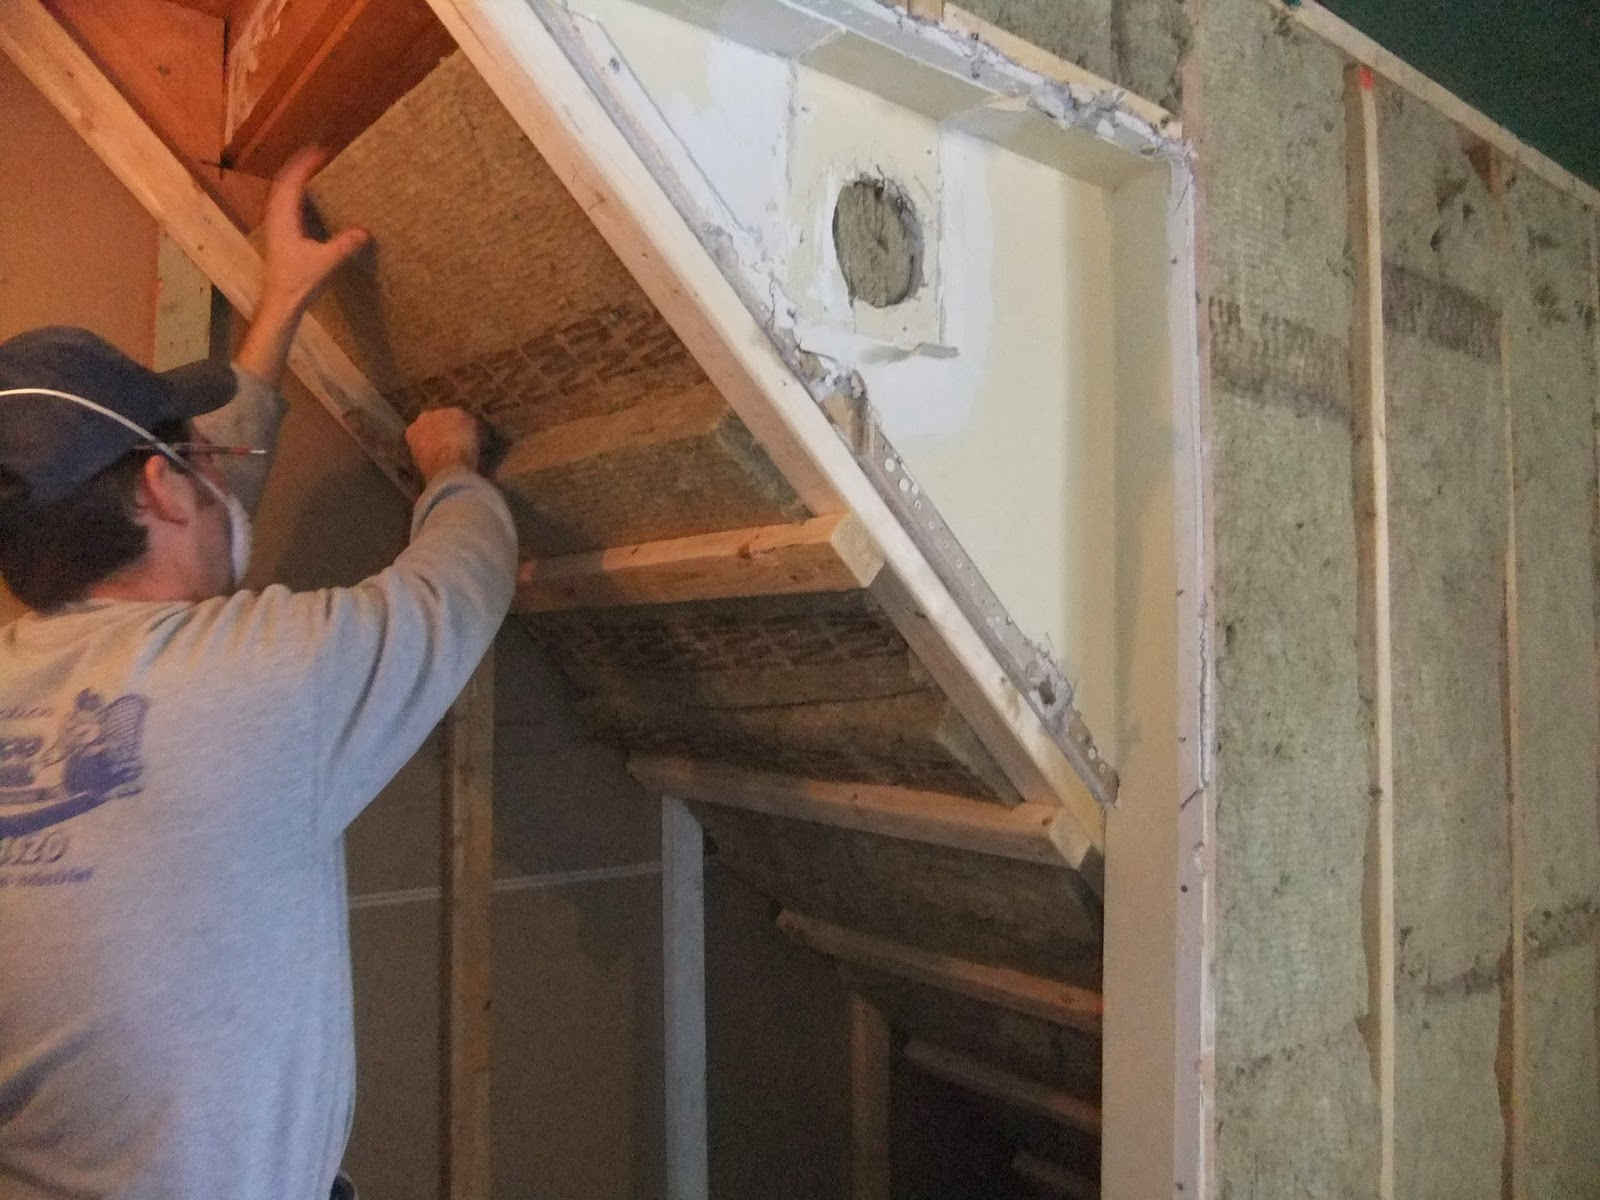 isoler une porte du bruit comment isoler une porte d. Black Bedroom Furniture Sets. Home Design Ideas